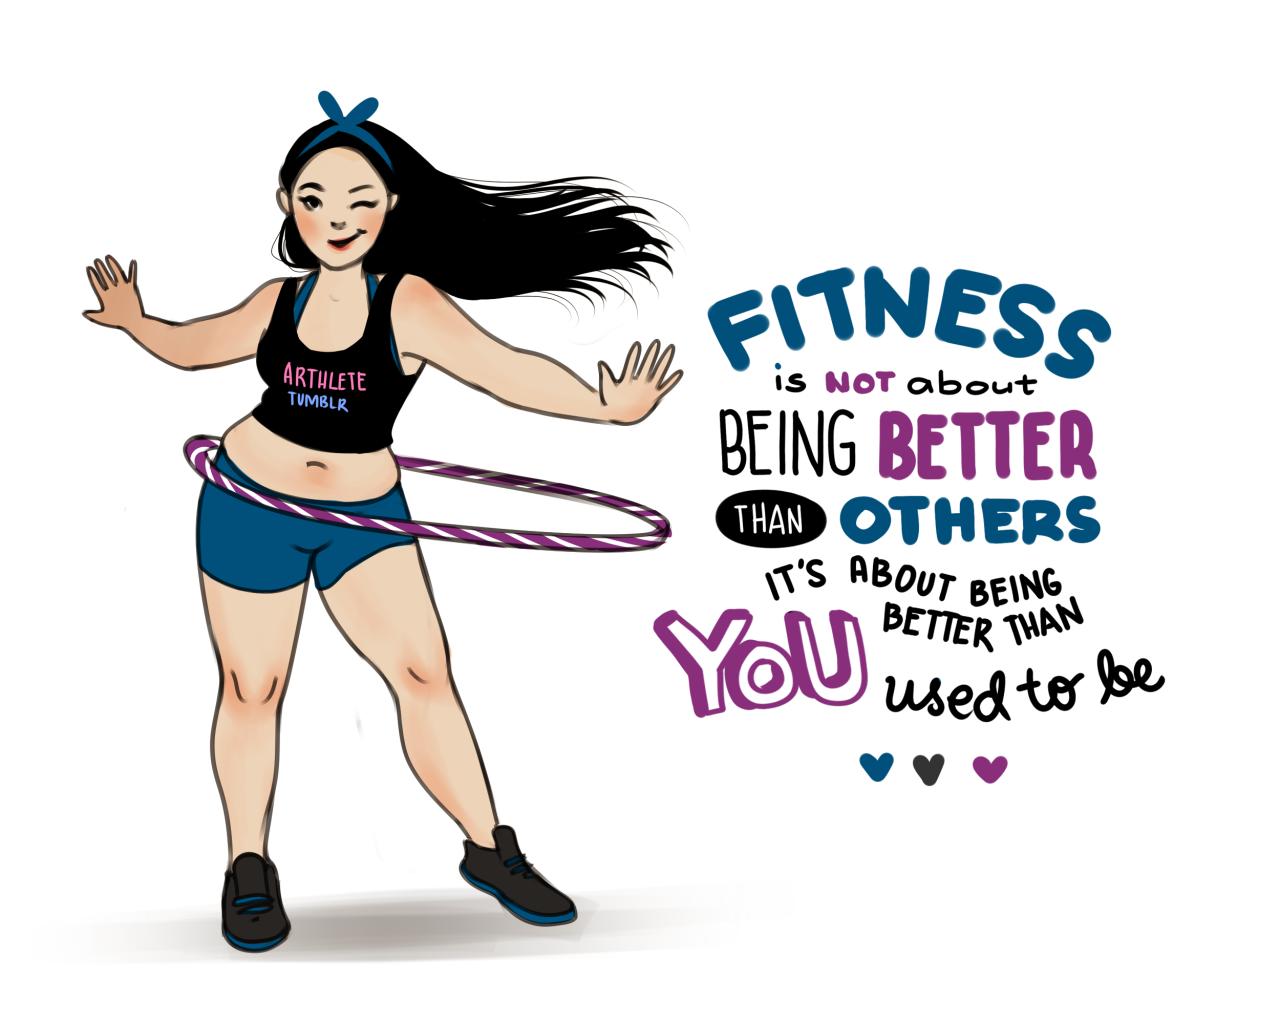 mensagens inspiracionais dieta 7 - grandes mulheres